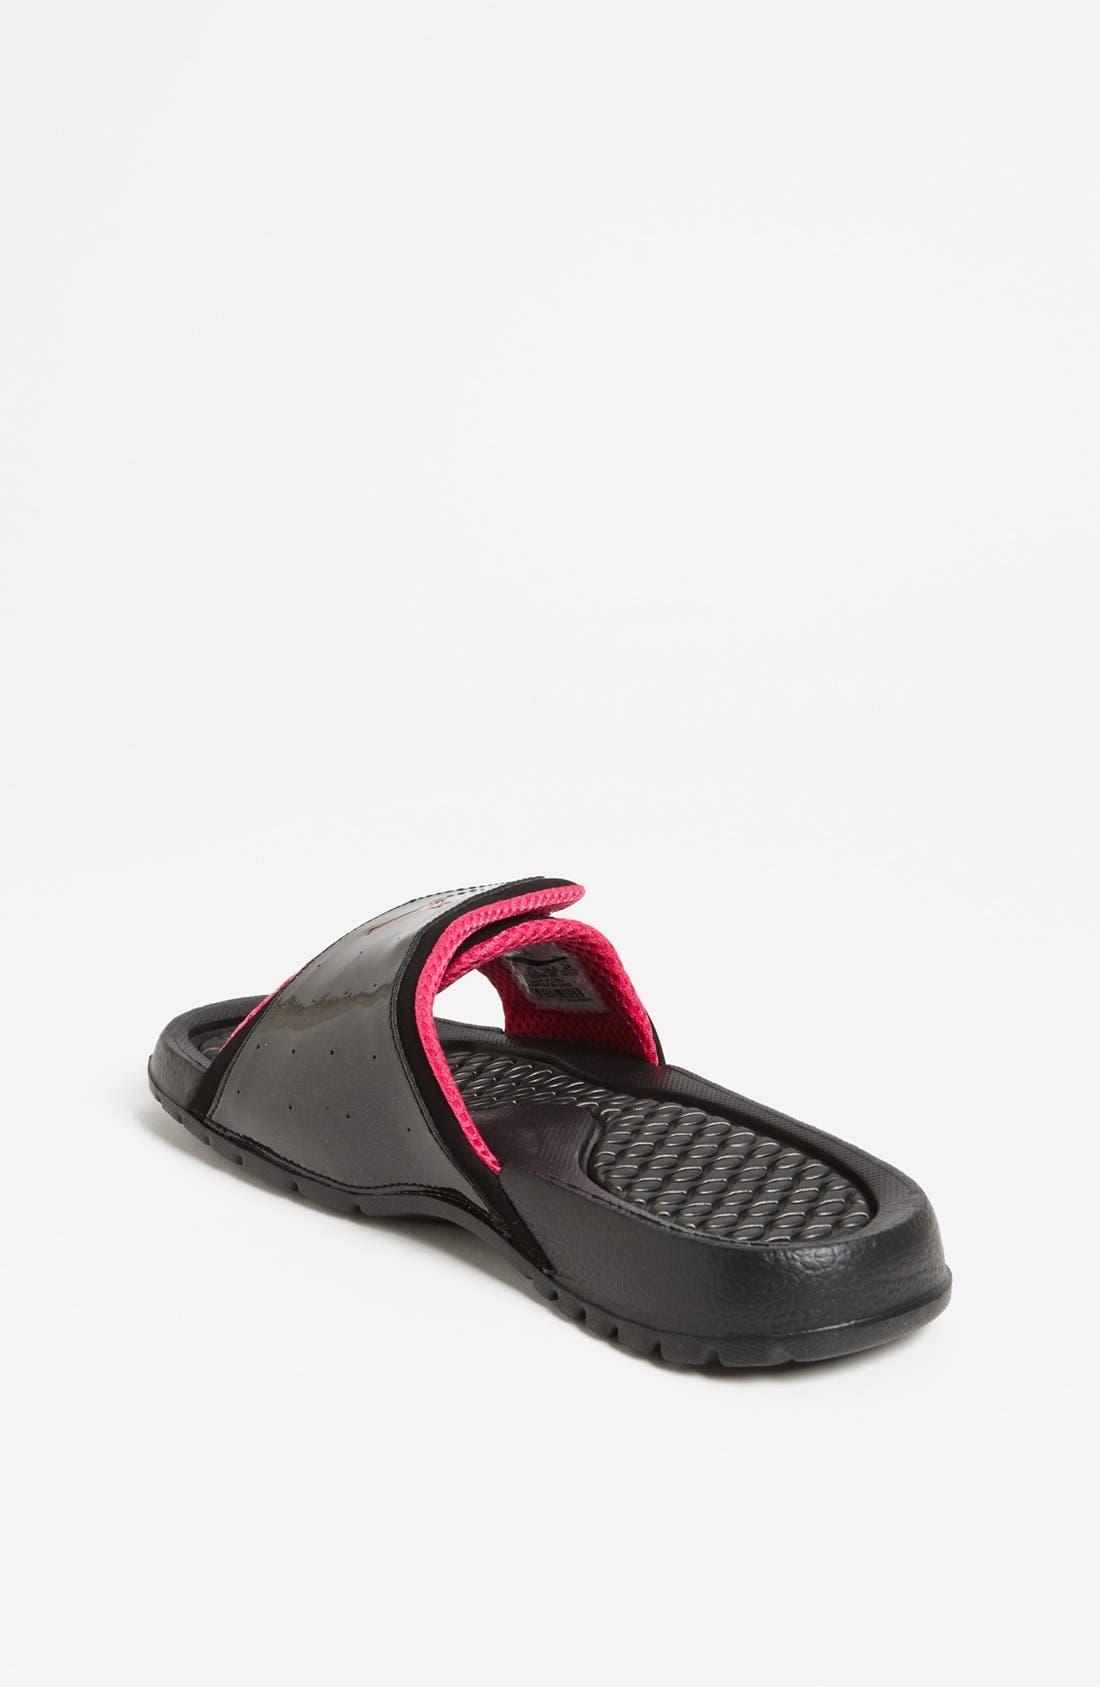 Alternate Image 2  - Nike 'Jordan Hydro II' Sandal (Big Kid)